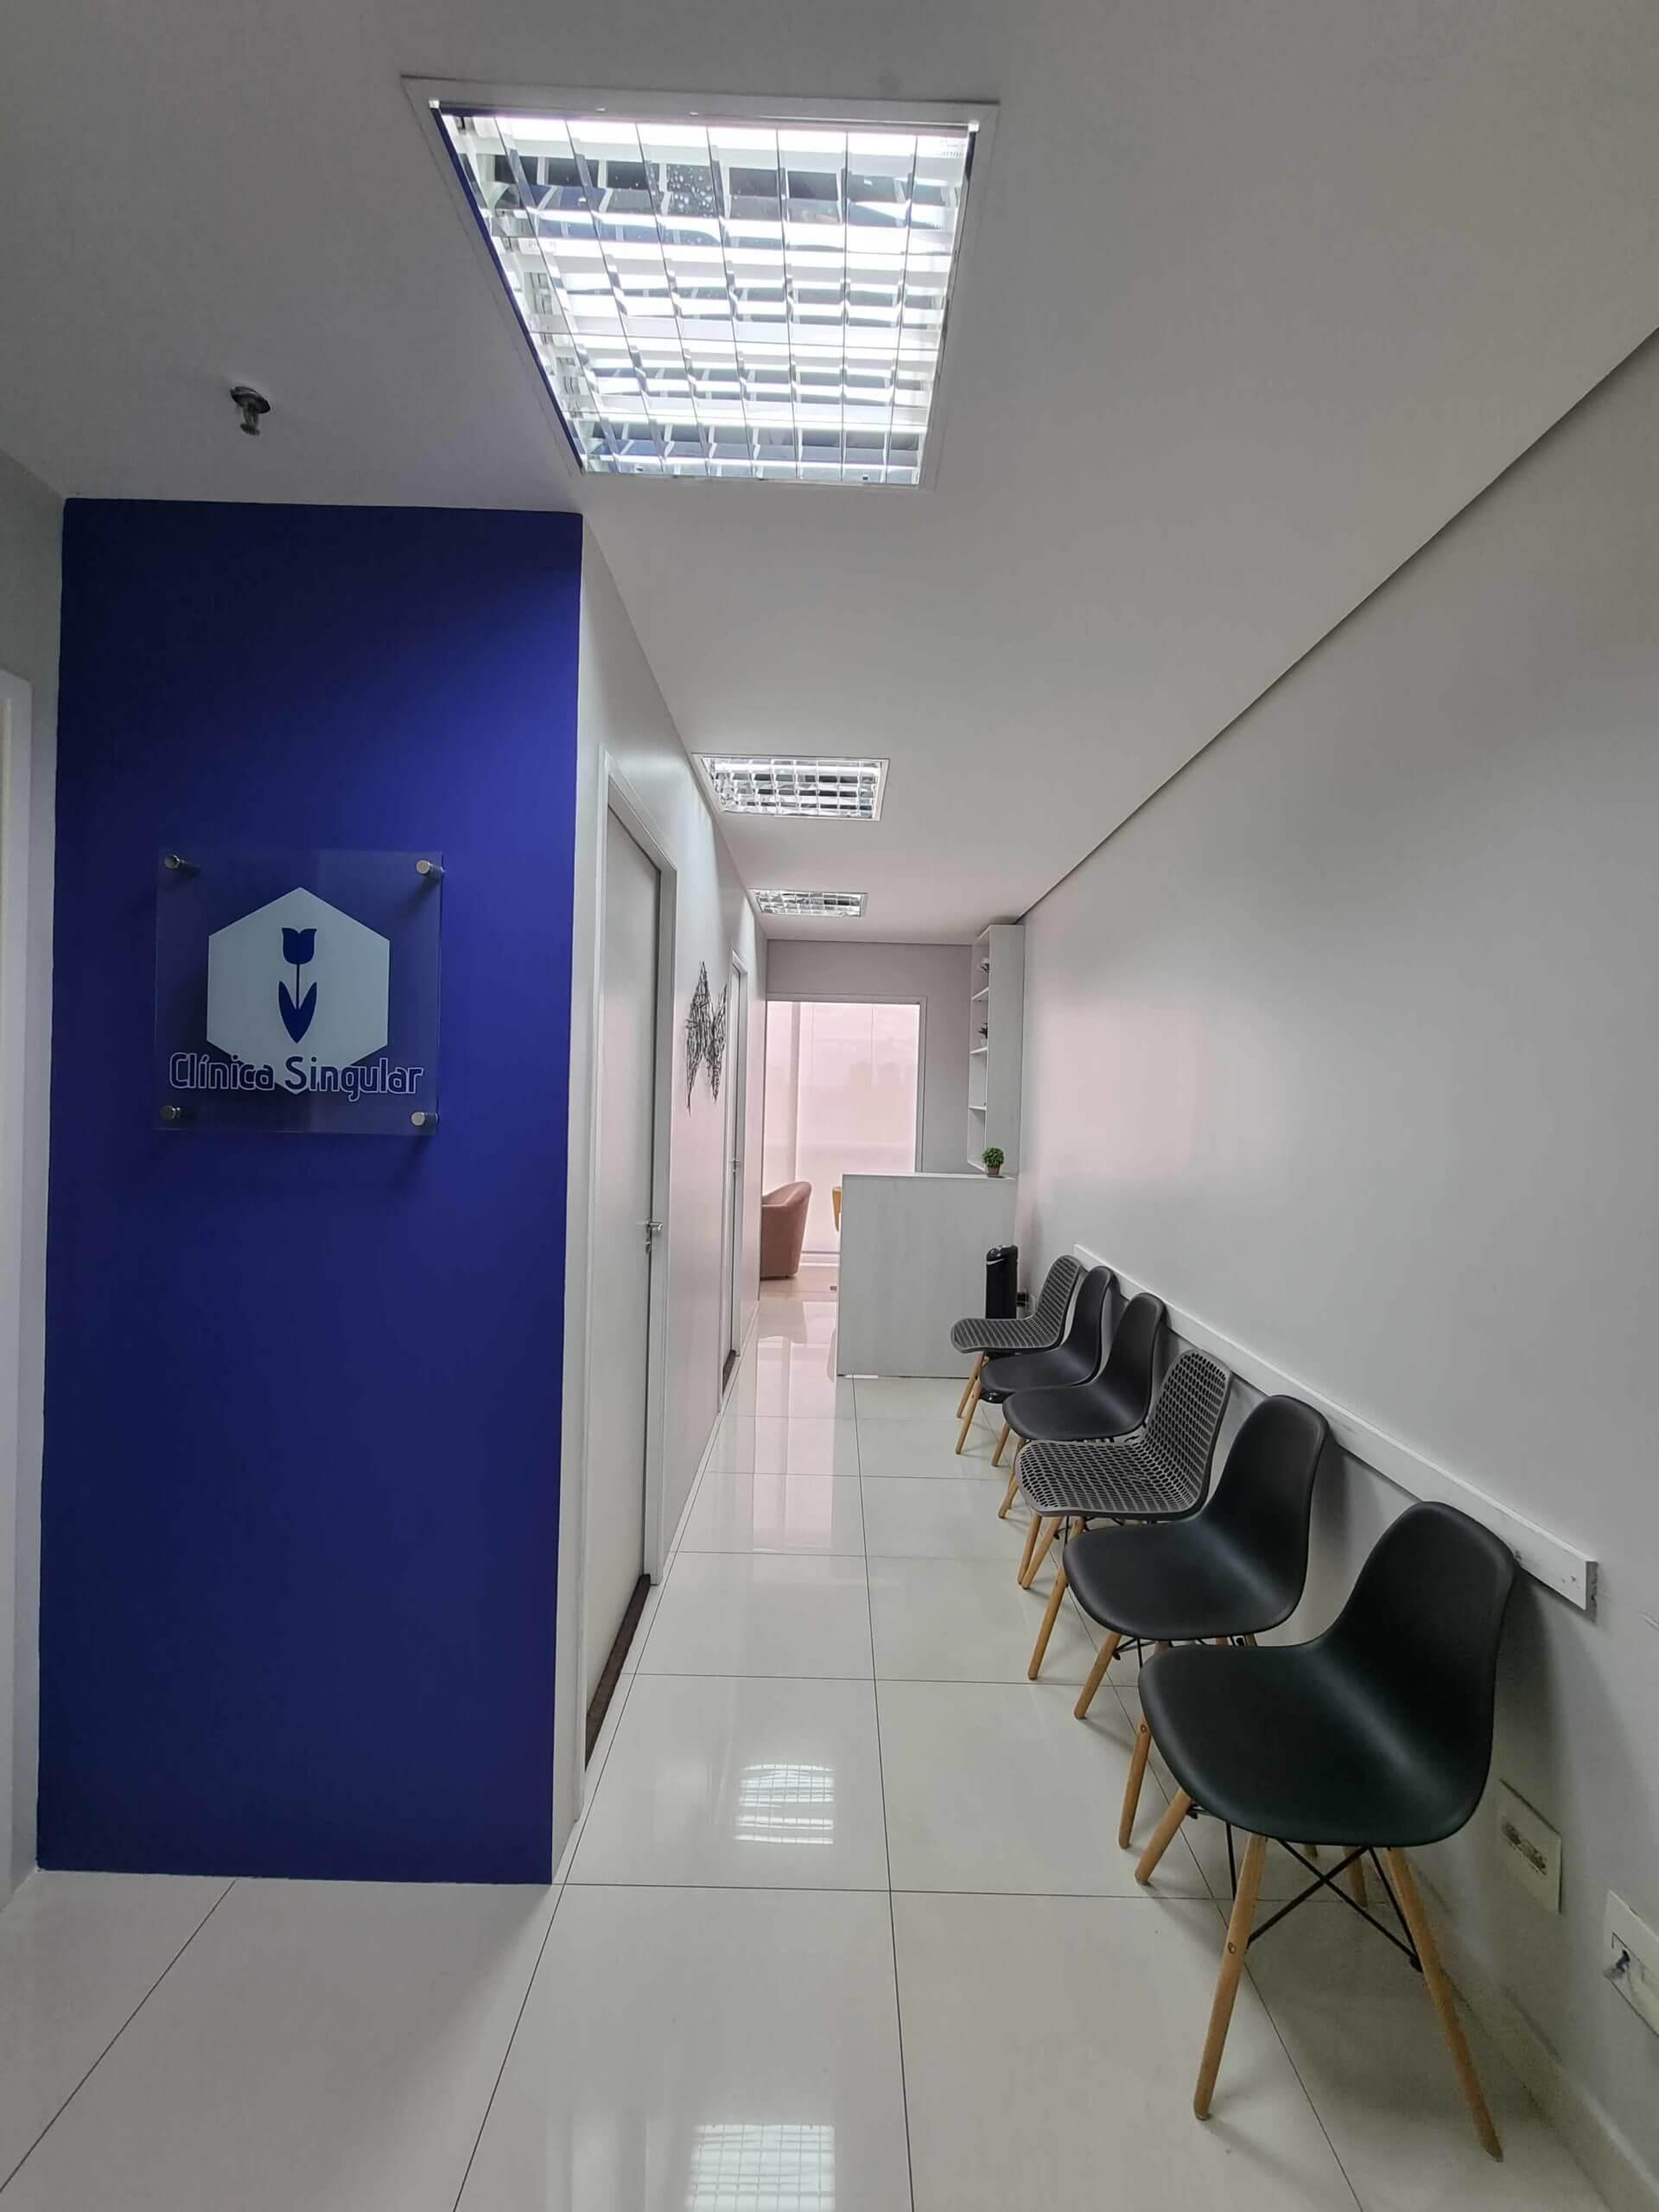 Clinica Singular Entrada